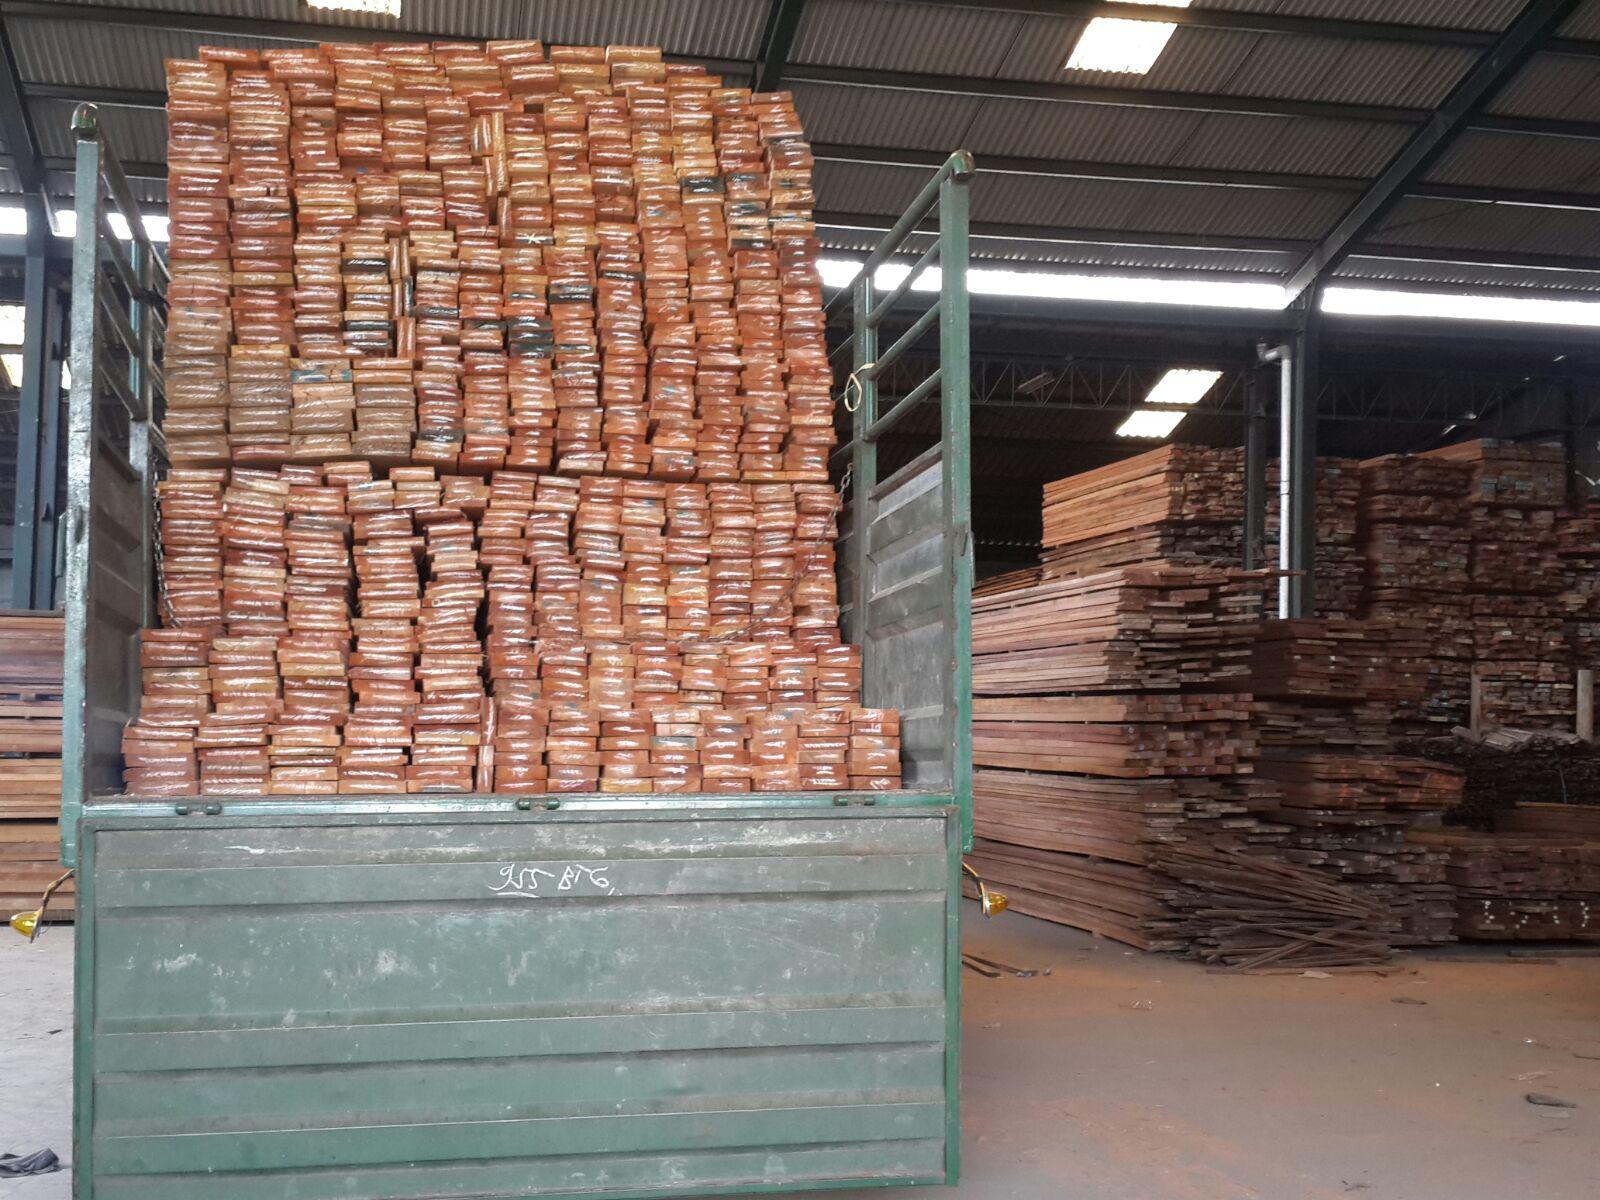 Olahan kayu, salah satu komditi unggulan Pontianak © Pontianakpost